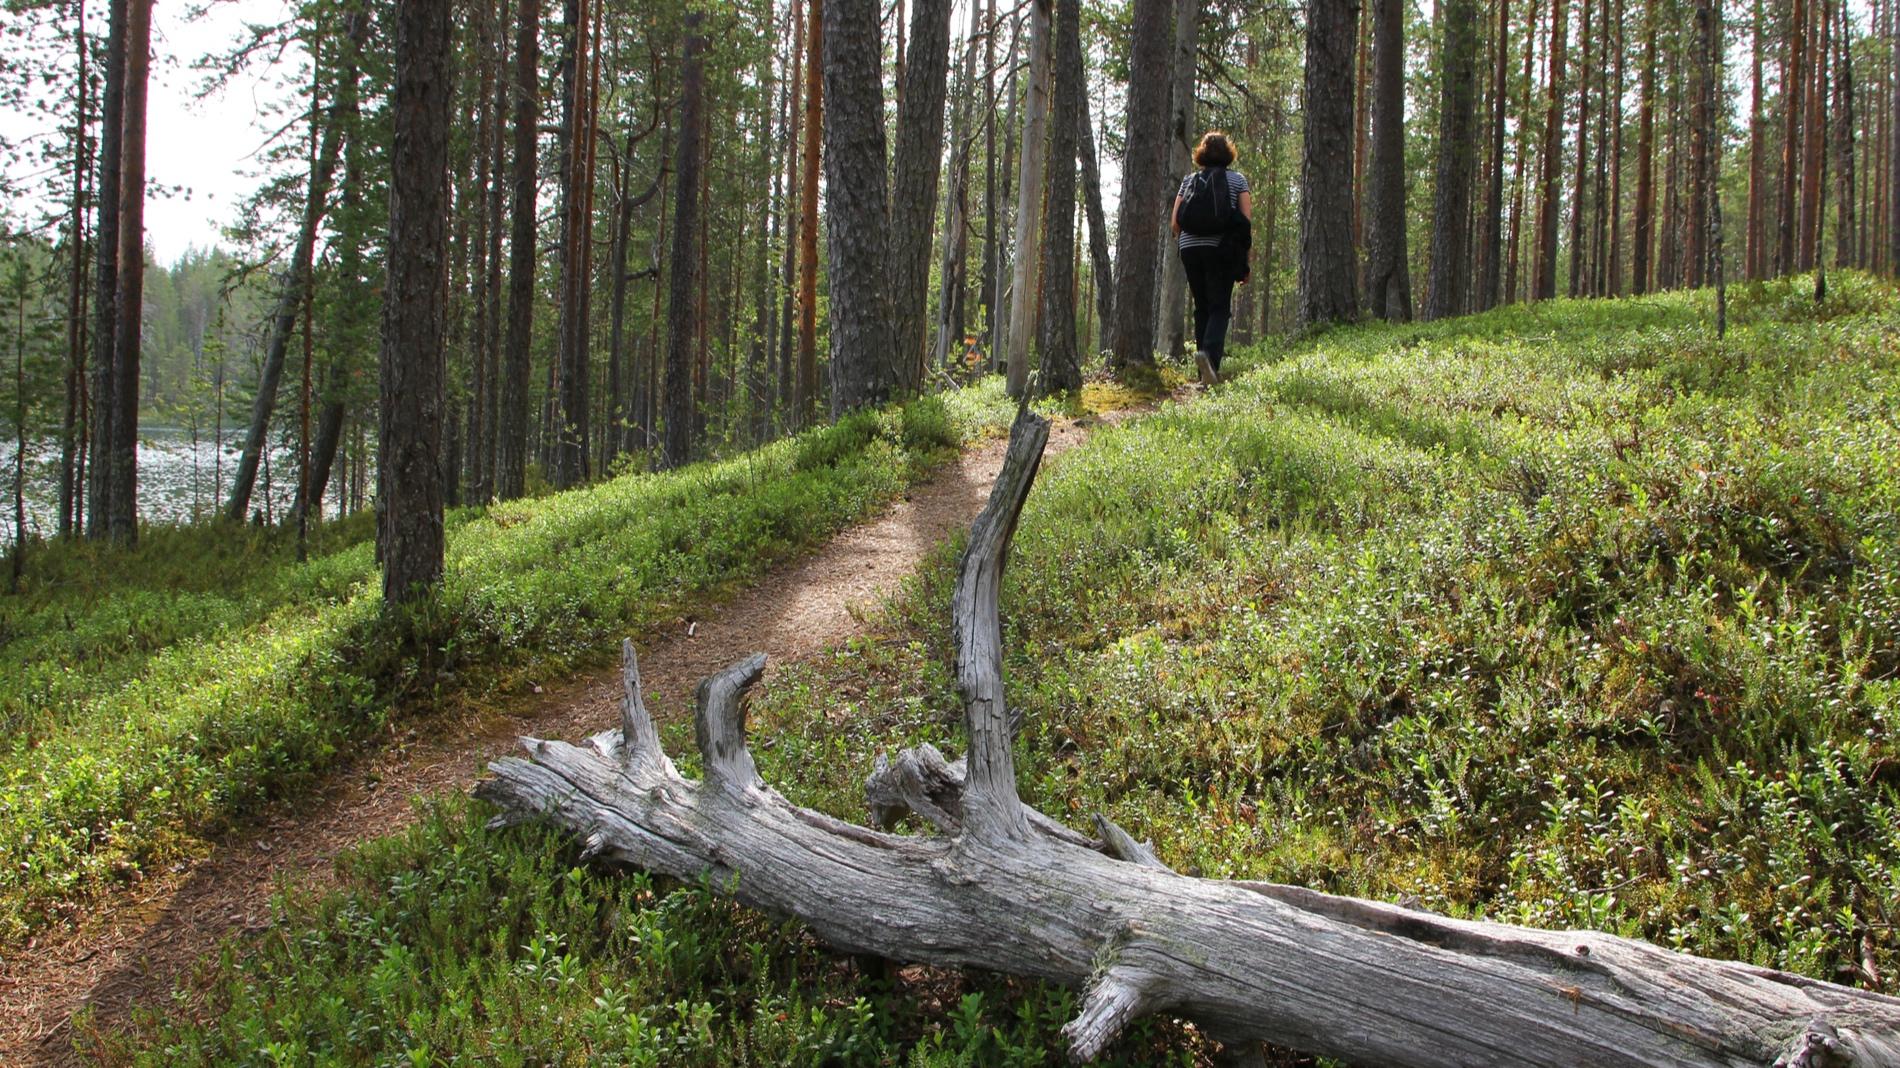 female-hiker-on-forest-trail-P55HR39.jpg